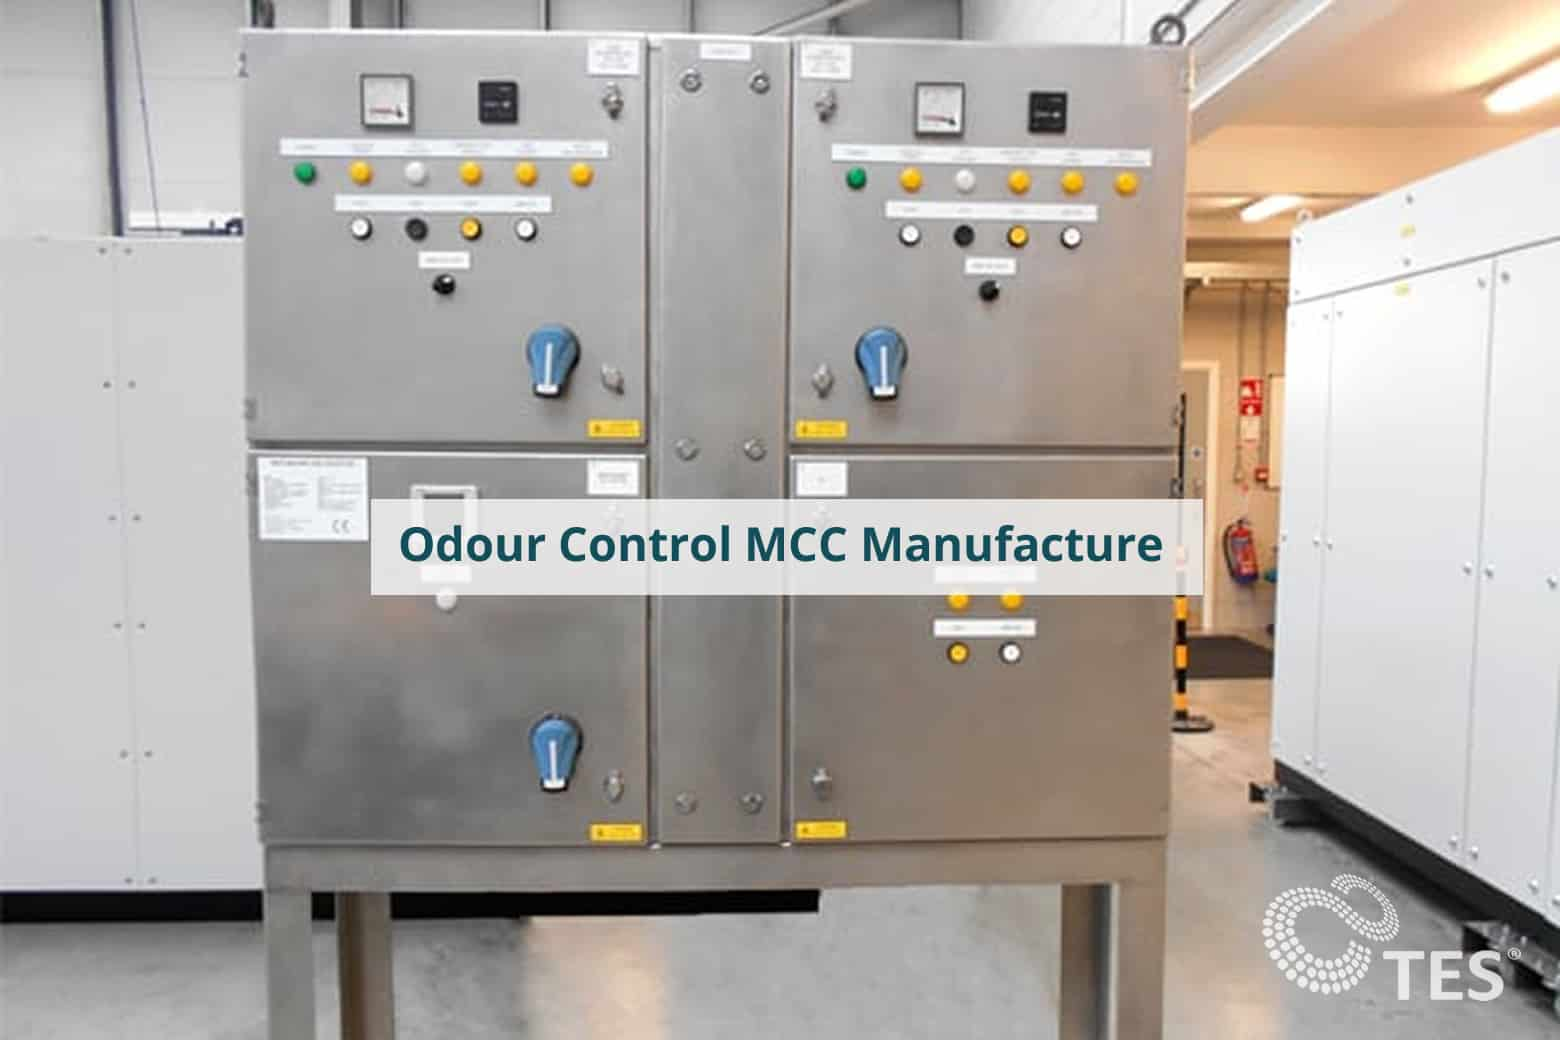 Odour Control MCC Manufacture